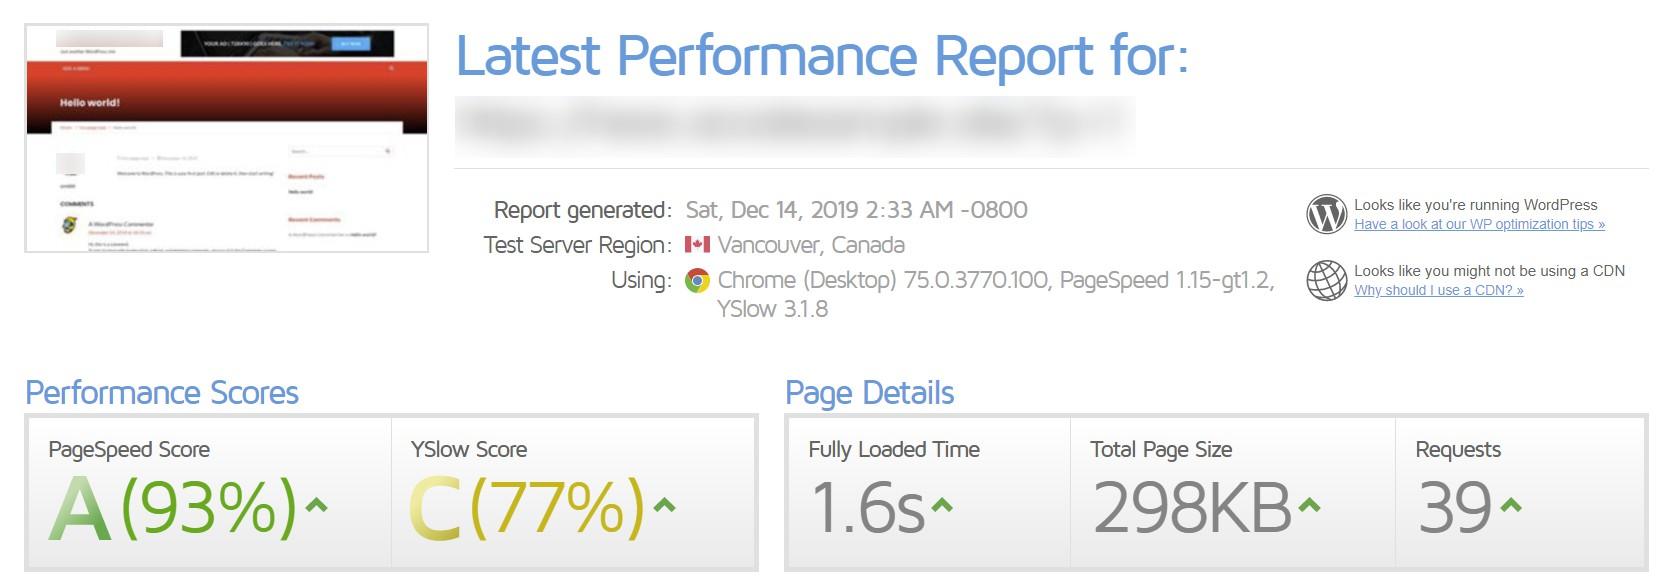 NewsMag speedtest results